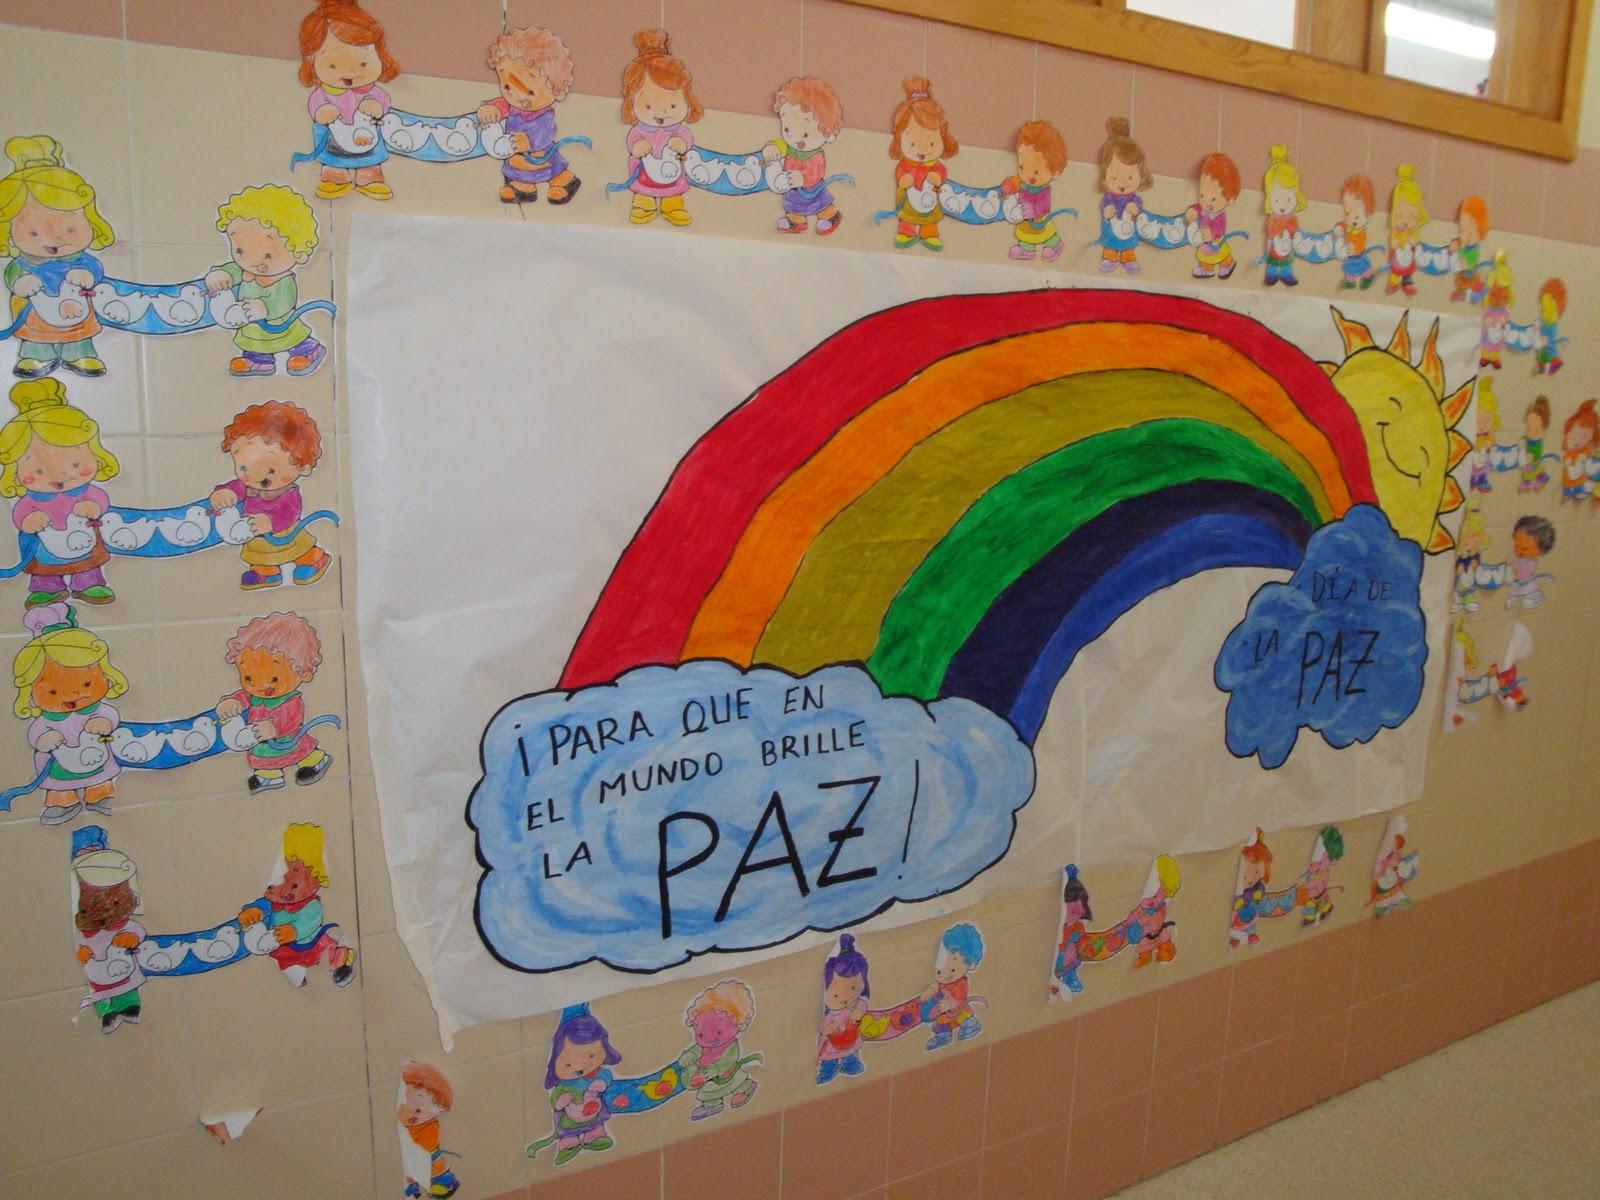 Rincón De Infantil Día De La Paz: El Rincón De Memes: Mural Del Día De La Paz